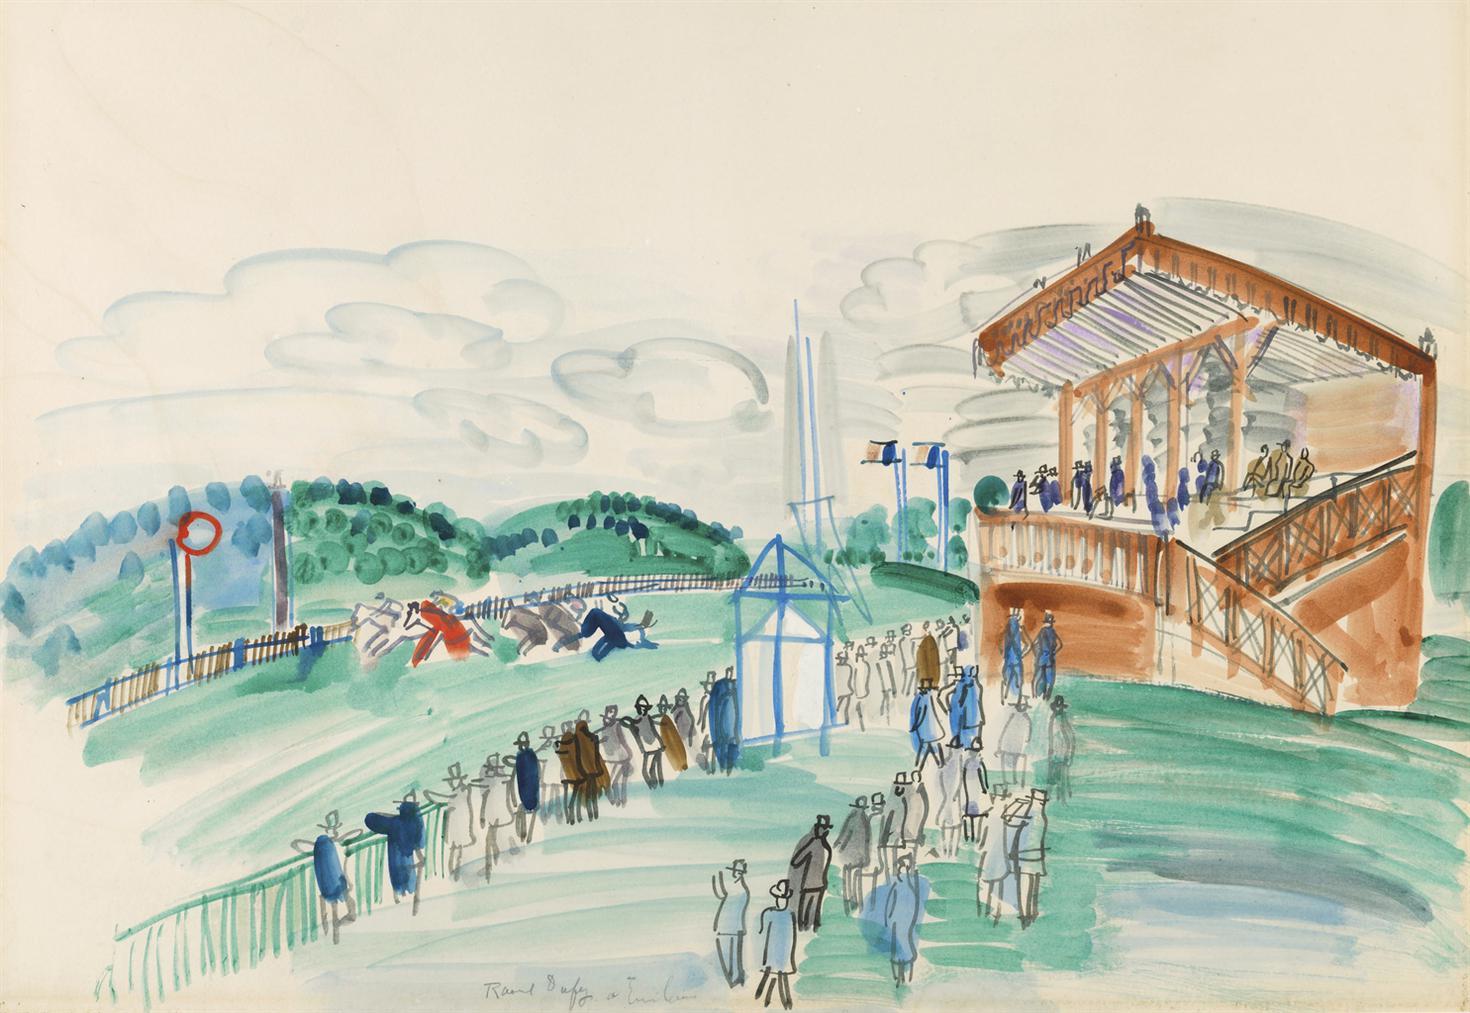 Raoul Dufy-Le Depart A Saint-Cloud-1931